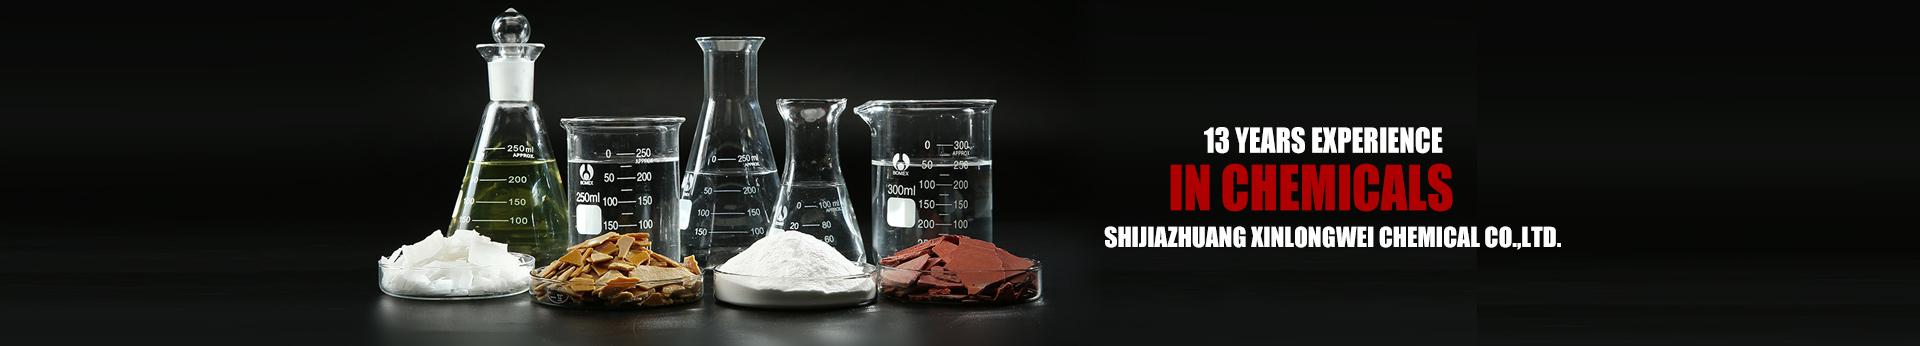 Oxidizing Chemical